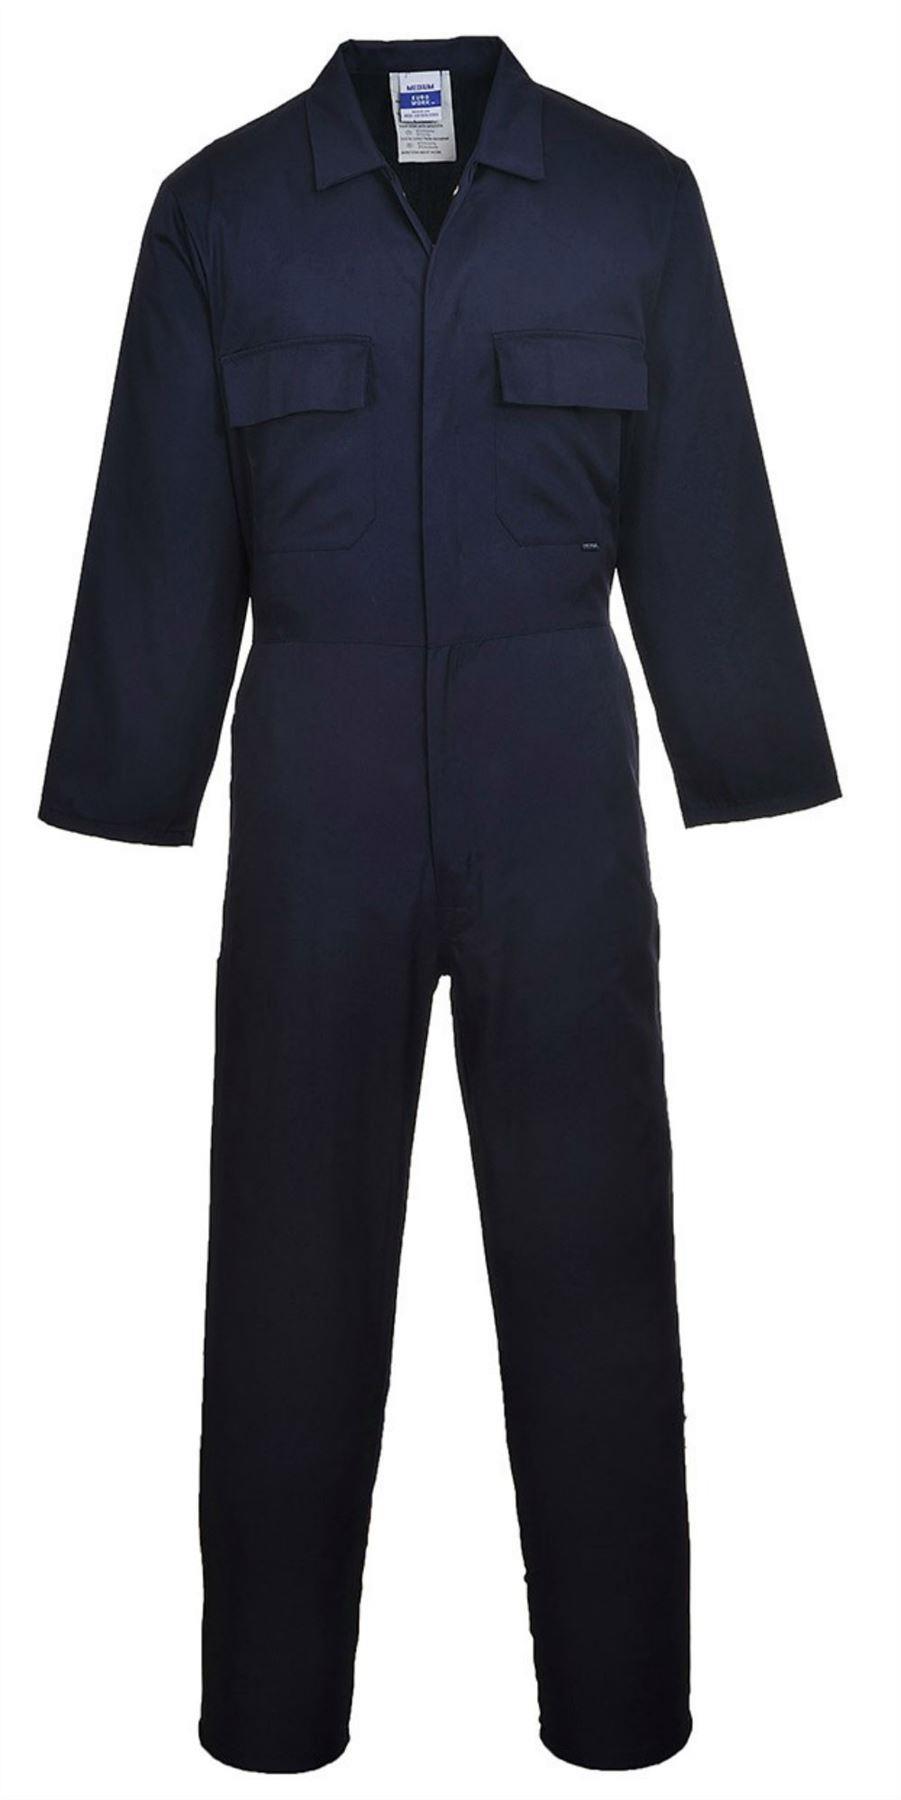 Portwest Standard Workwear Overalls - Navy 3XL